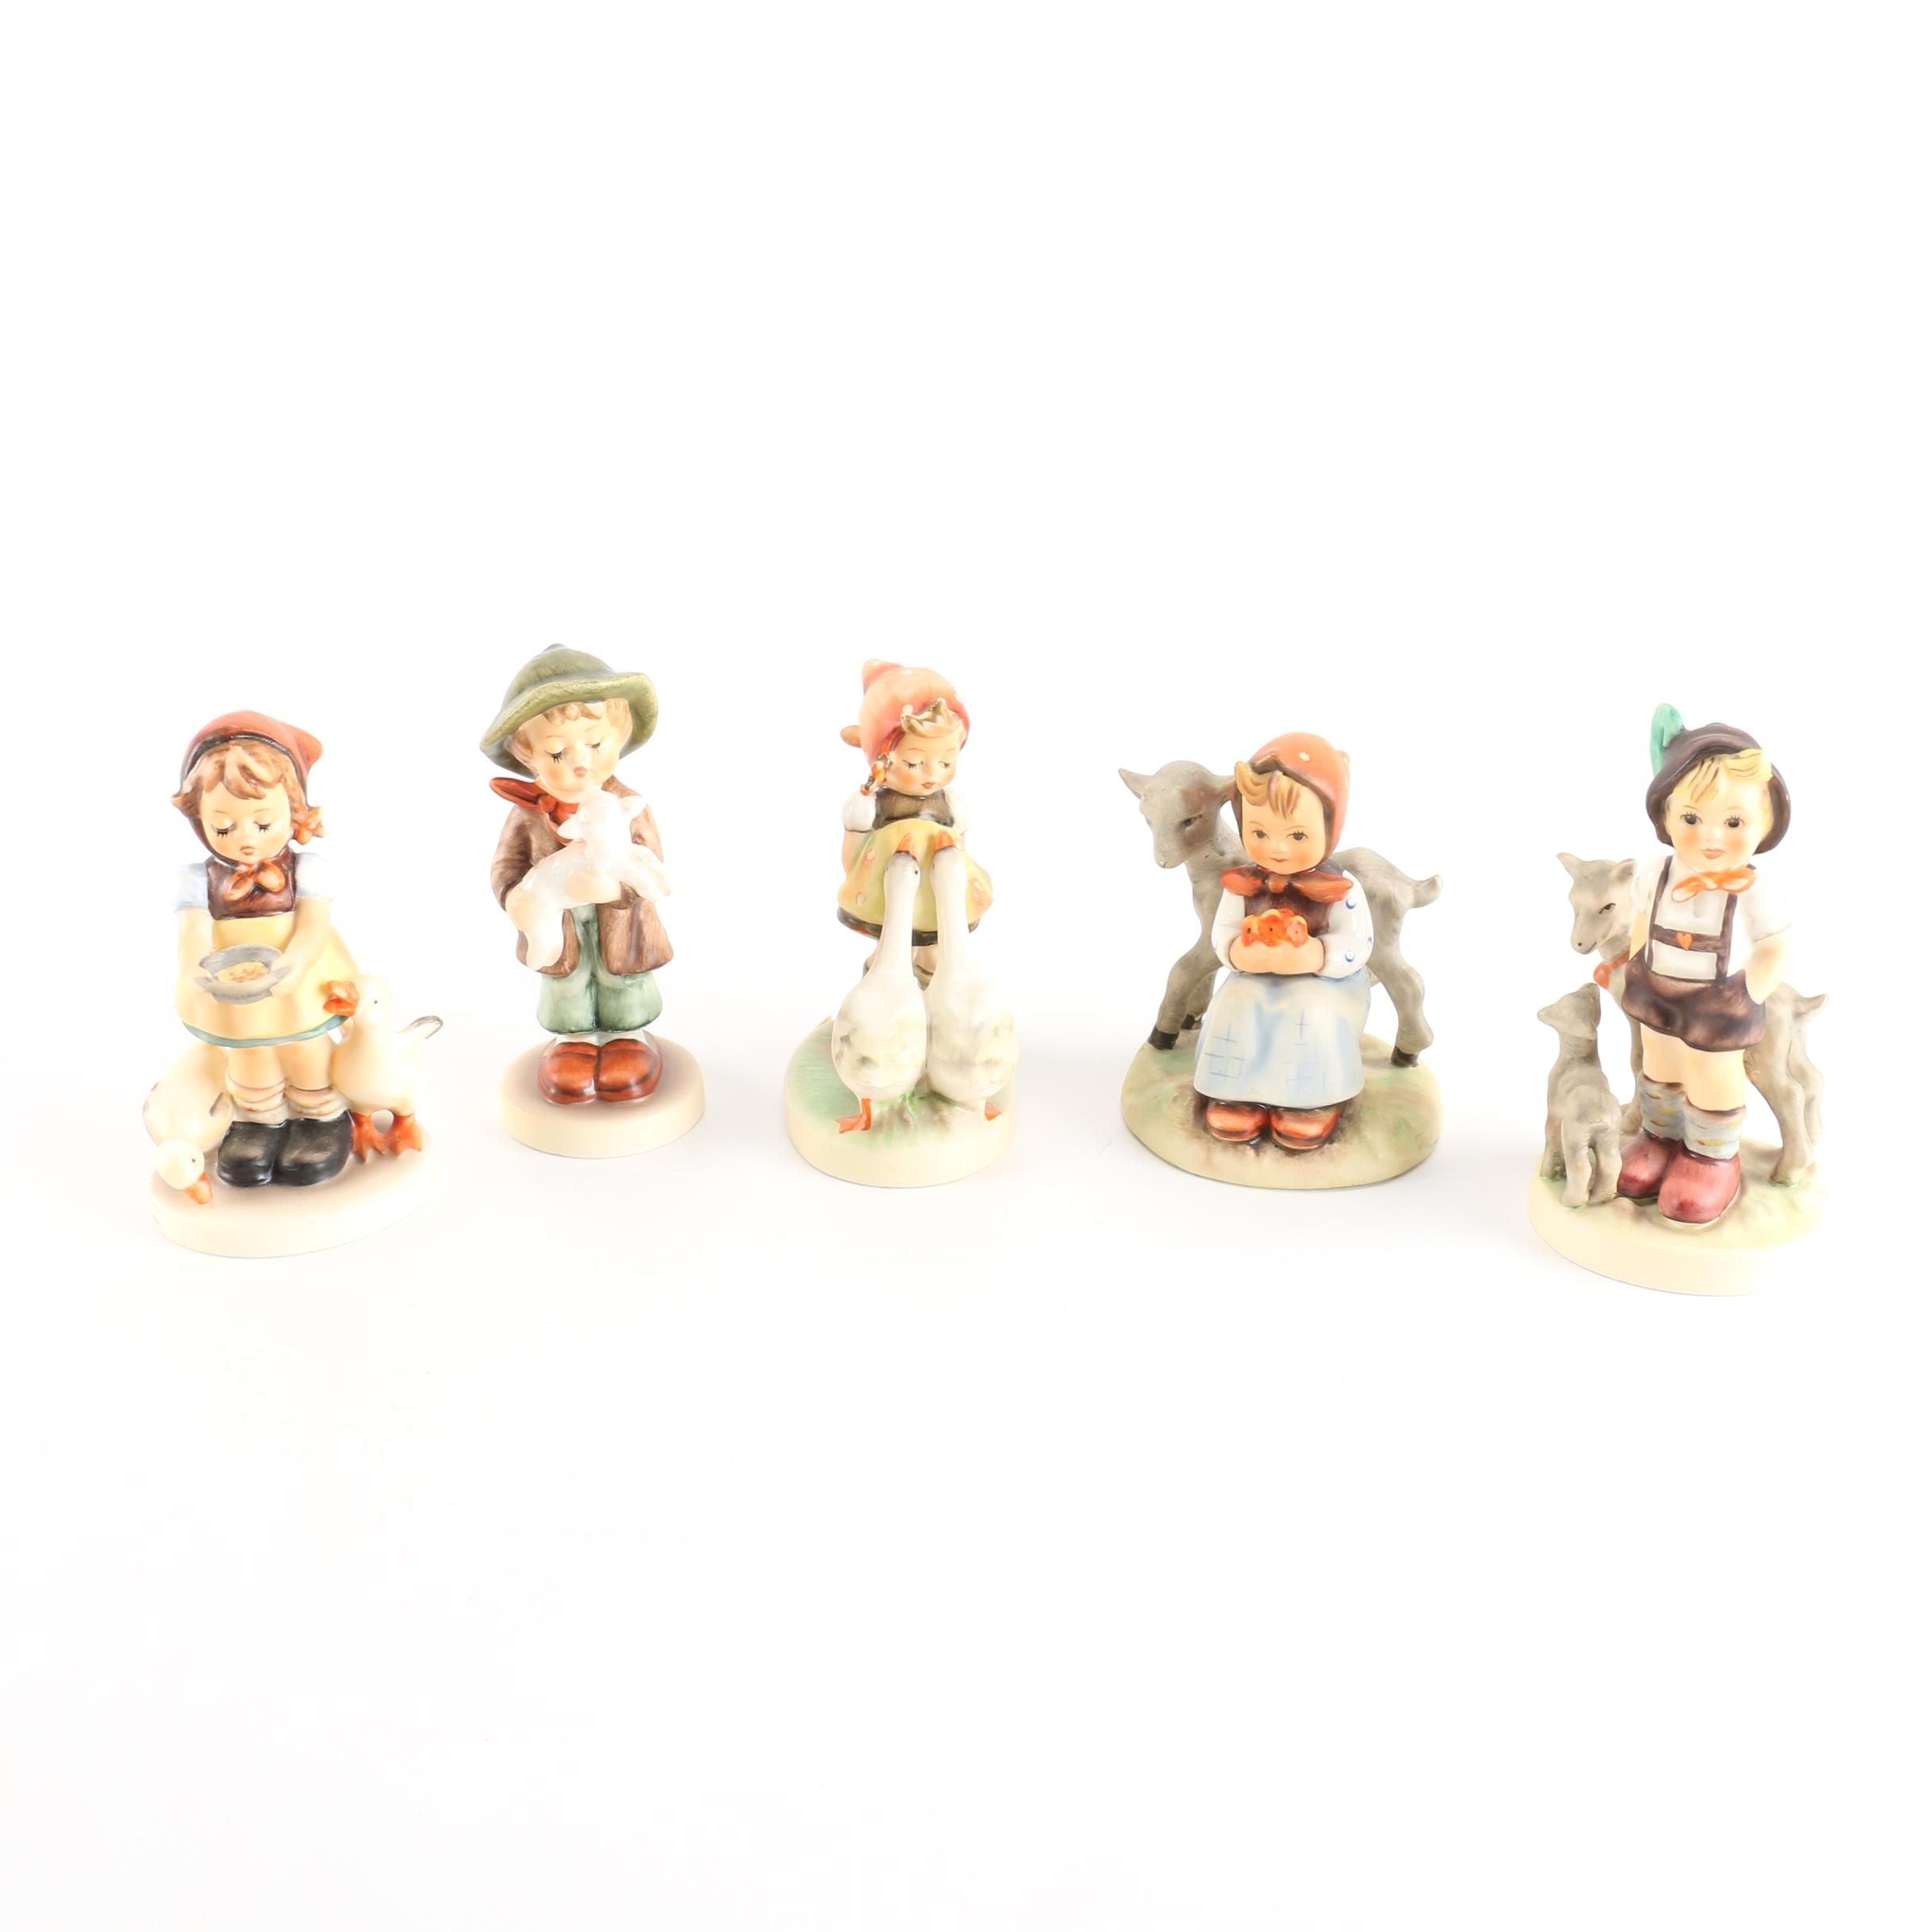 Hummel Figurines With Animals